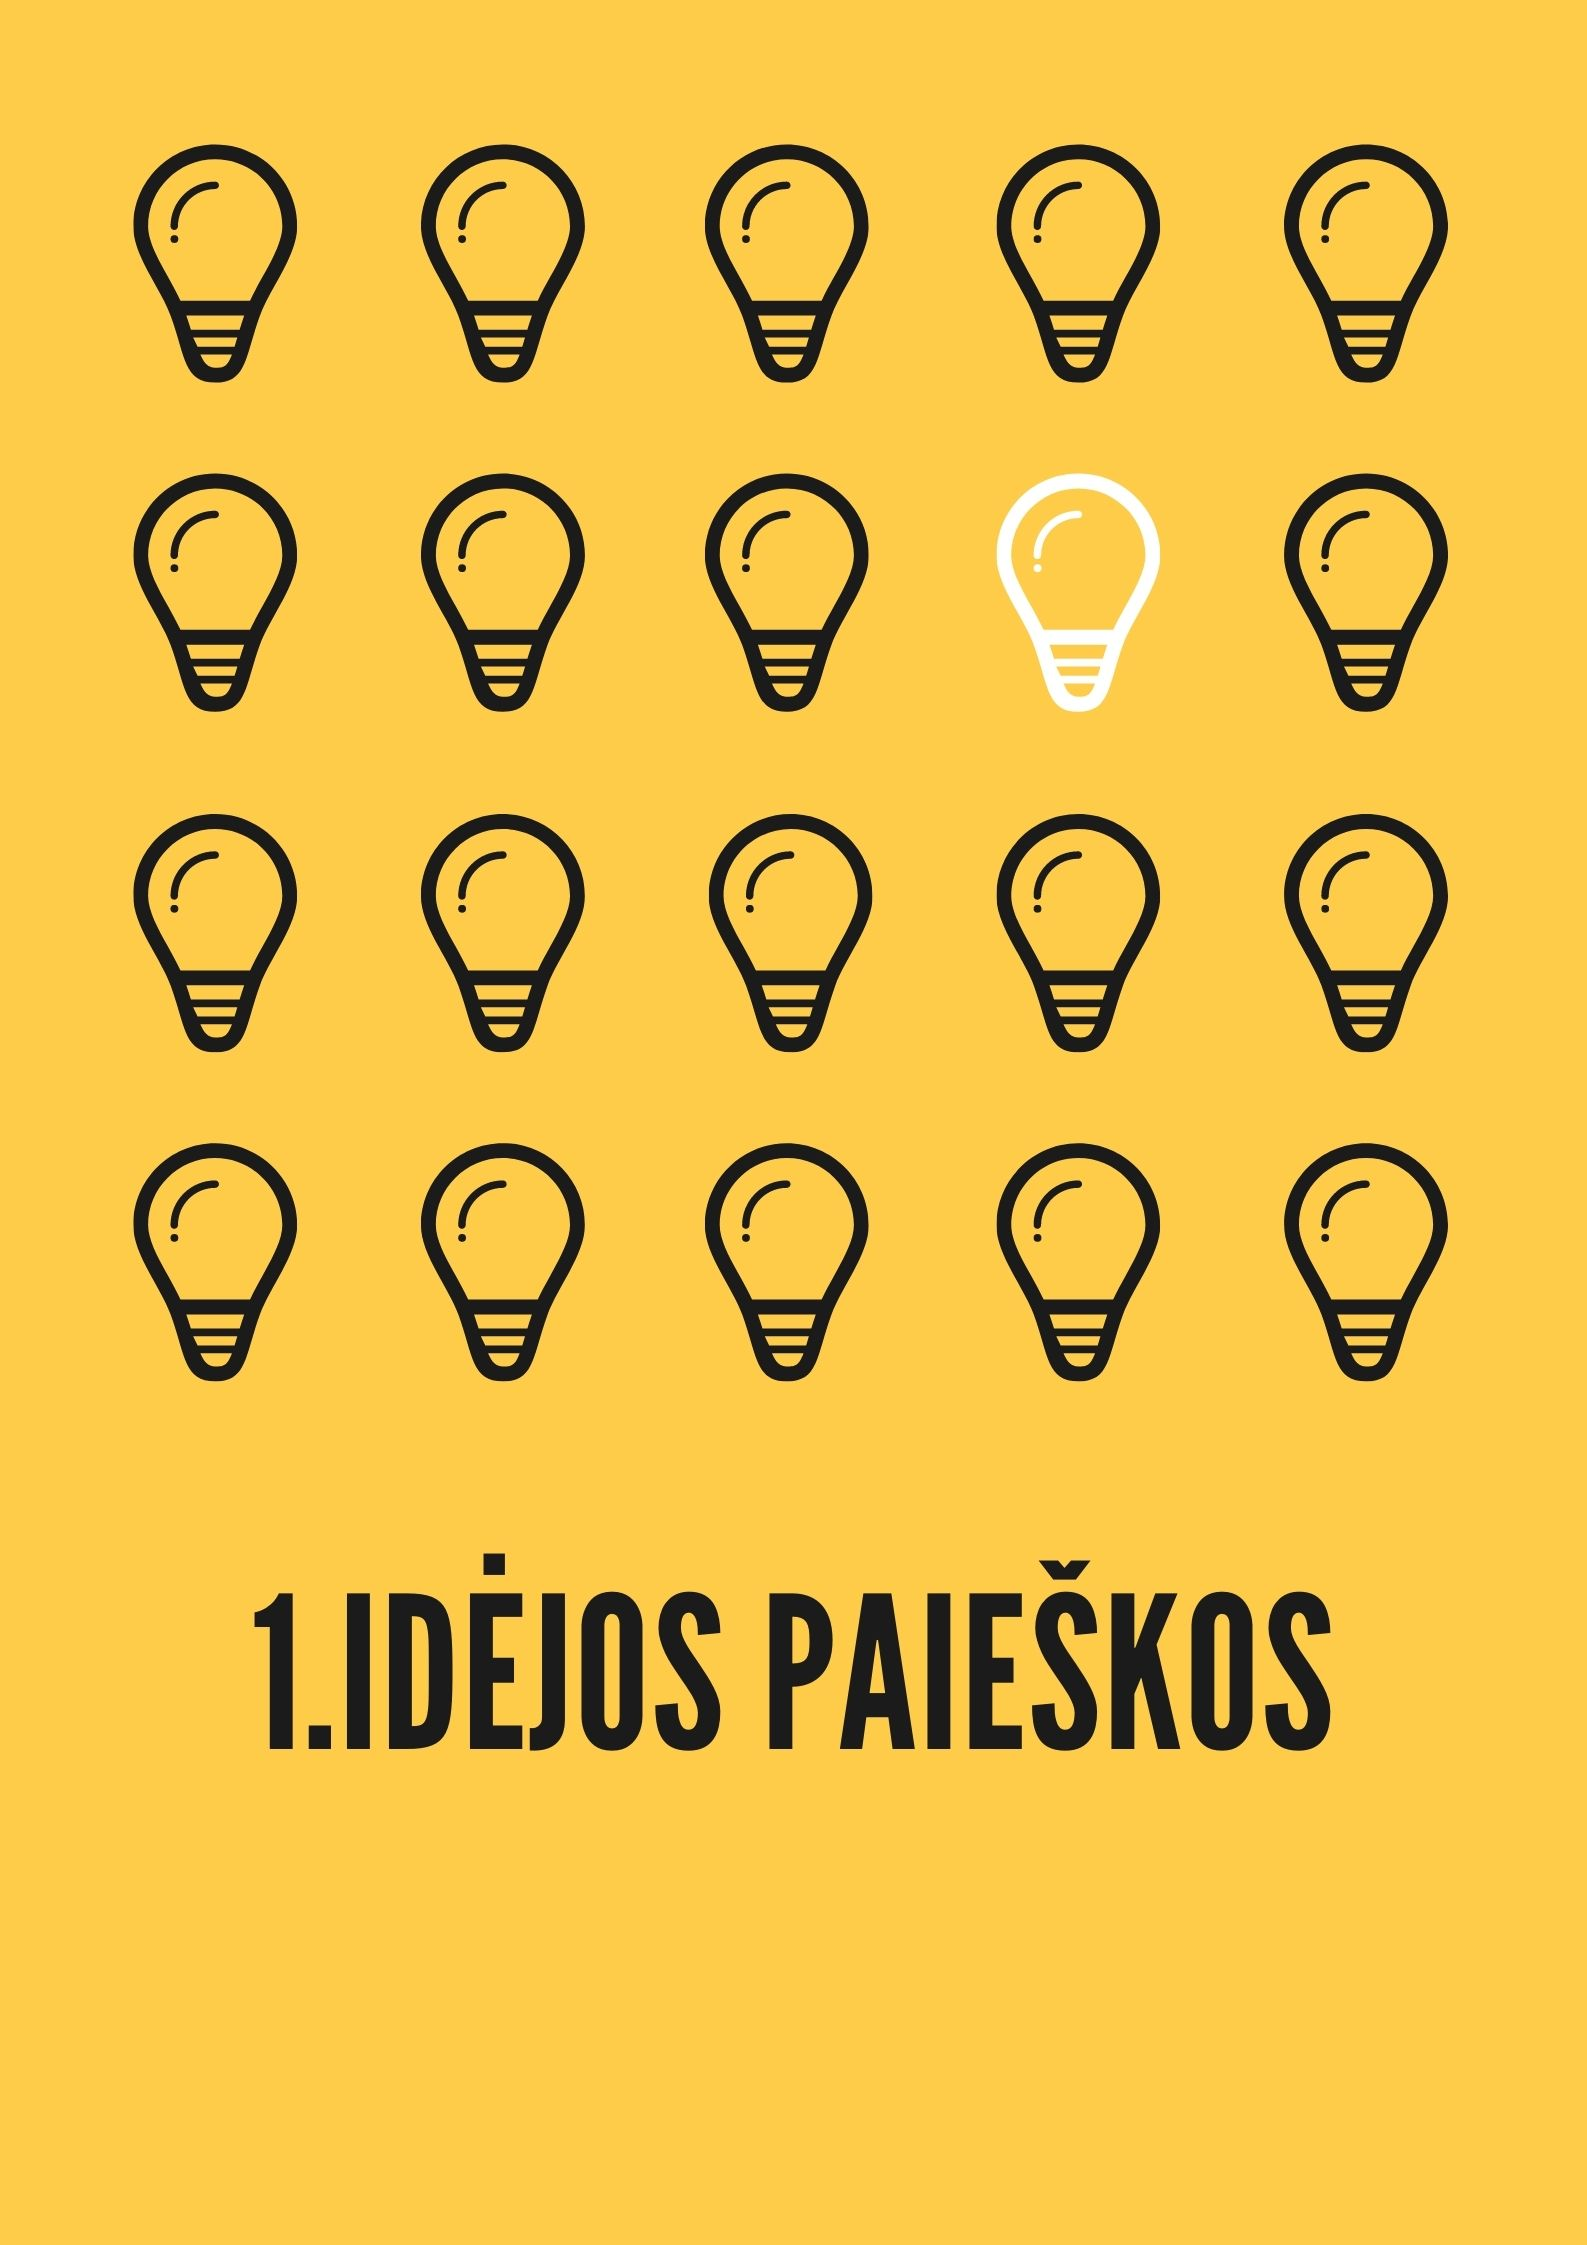 idejos-paieskos